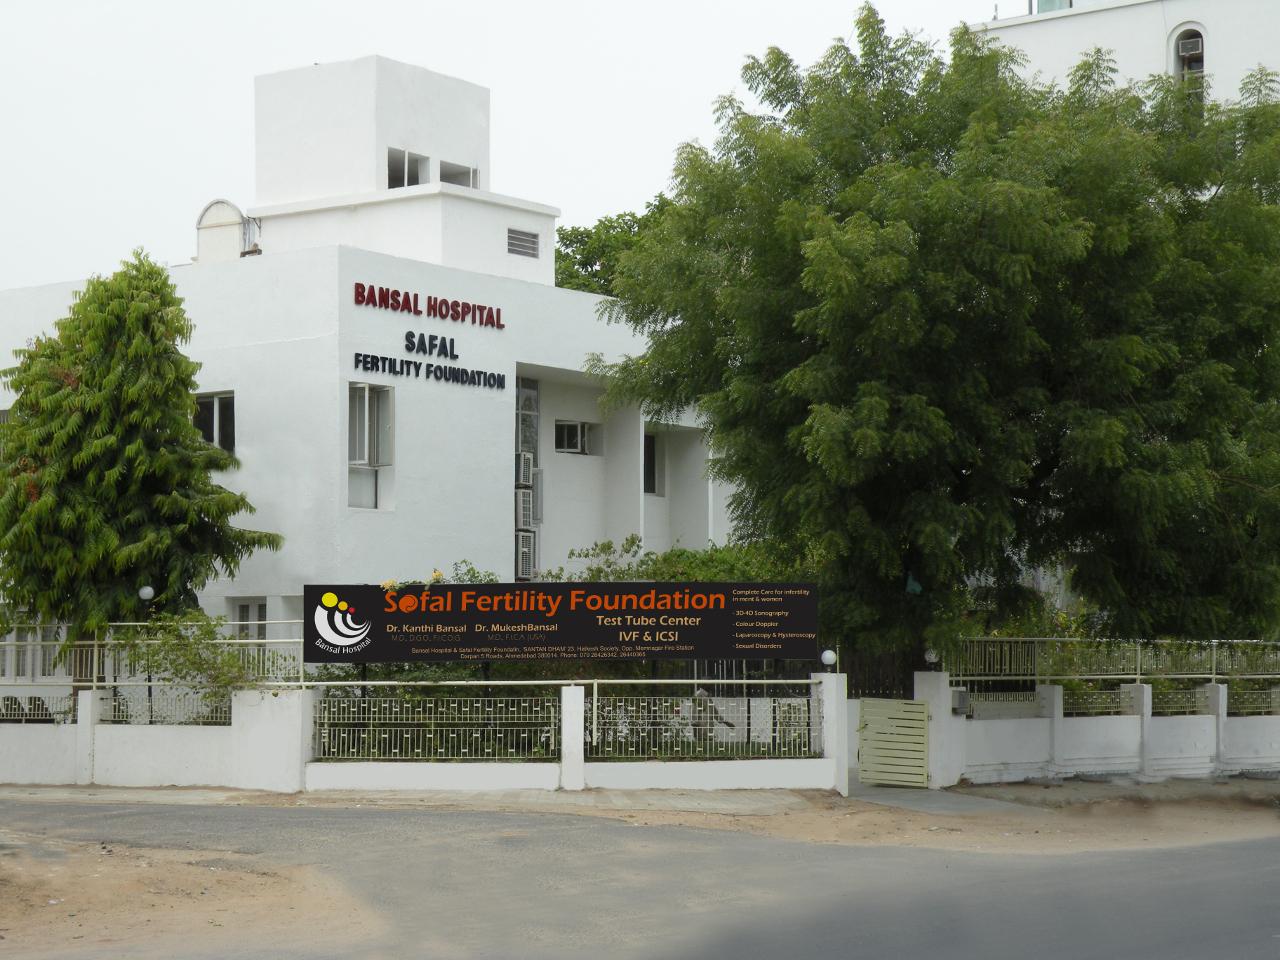 Safal Fertility Foundation & Bansal Hospital